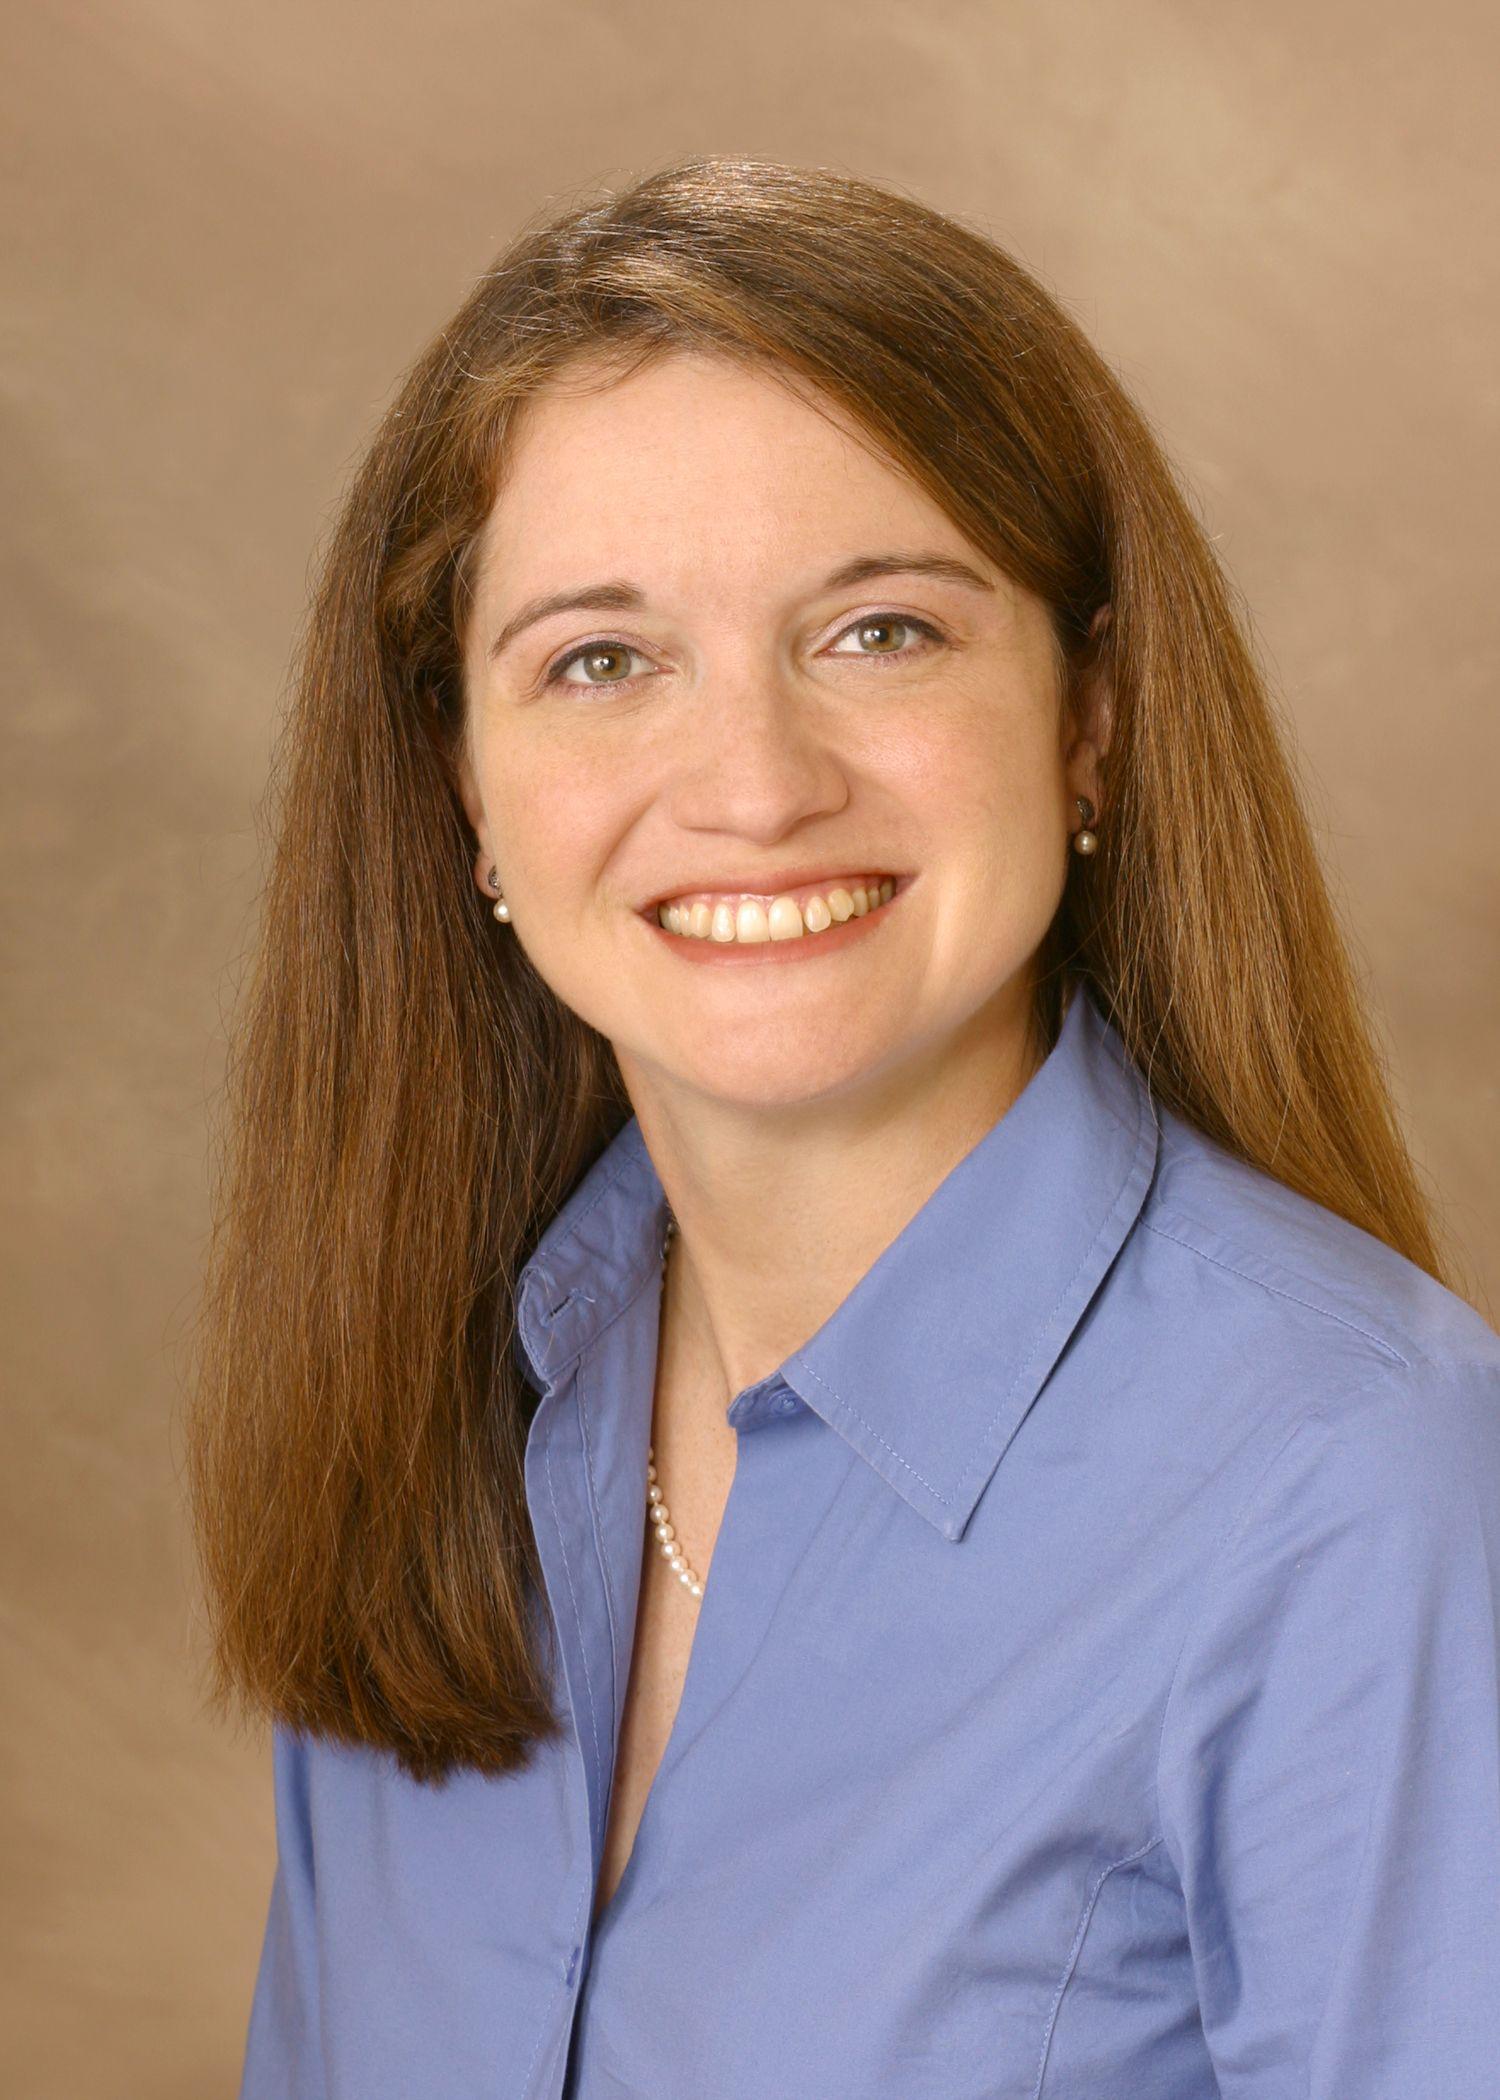 Miriam S. McAtee, M.D. - Pediatric Associates of Richmond